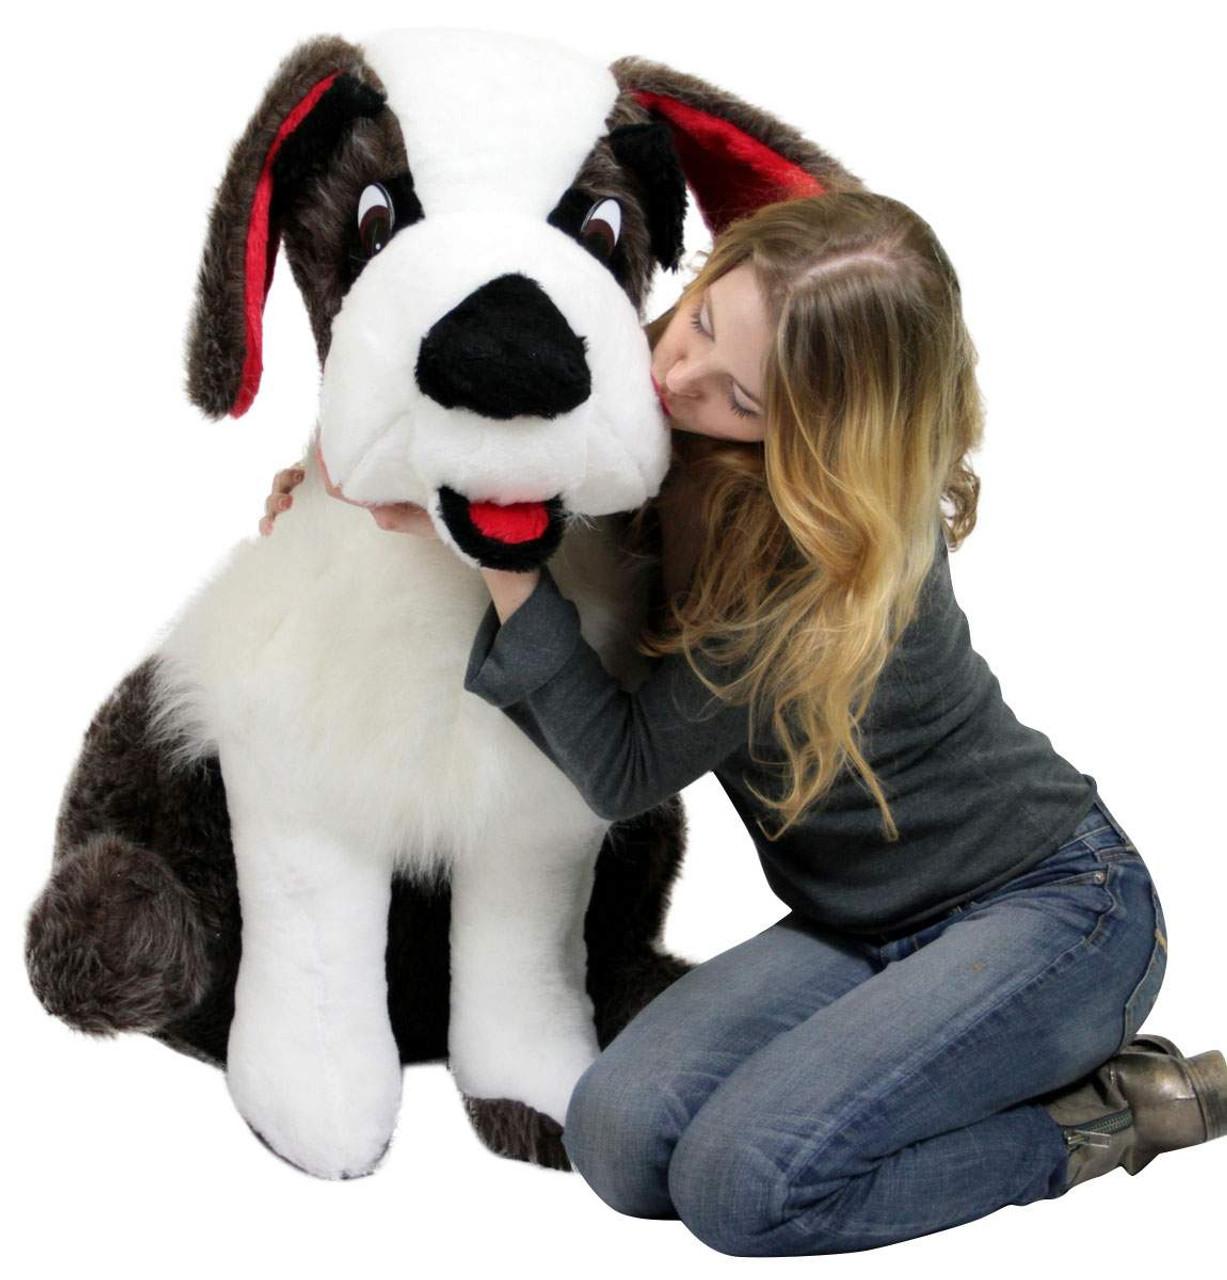 american made life size stuffed saint bernard 38 inch soft big plush dog whimsical pooch big. Black Bedroom Furniture Sets. Home Design Ideas